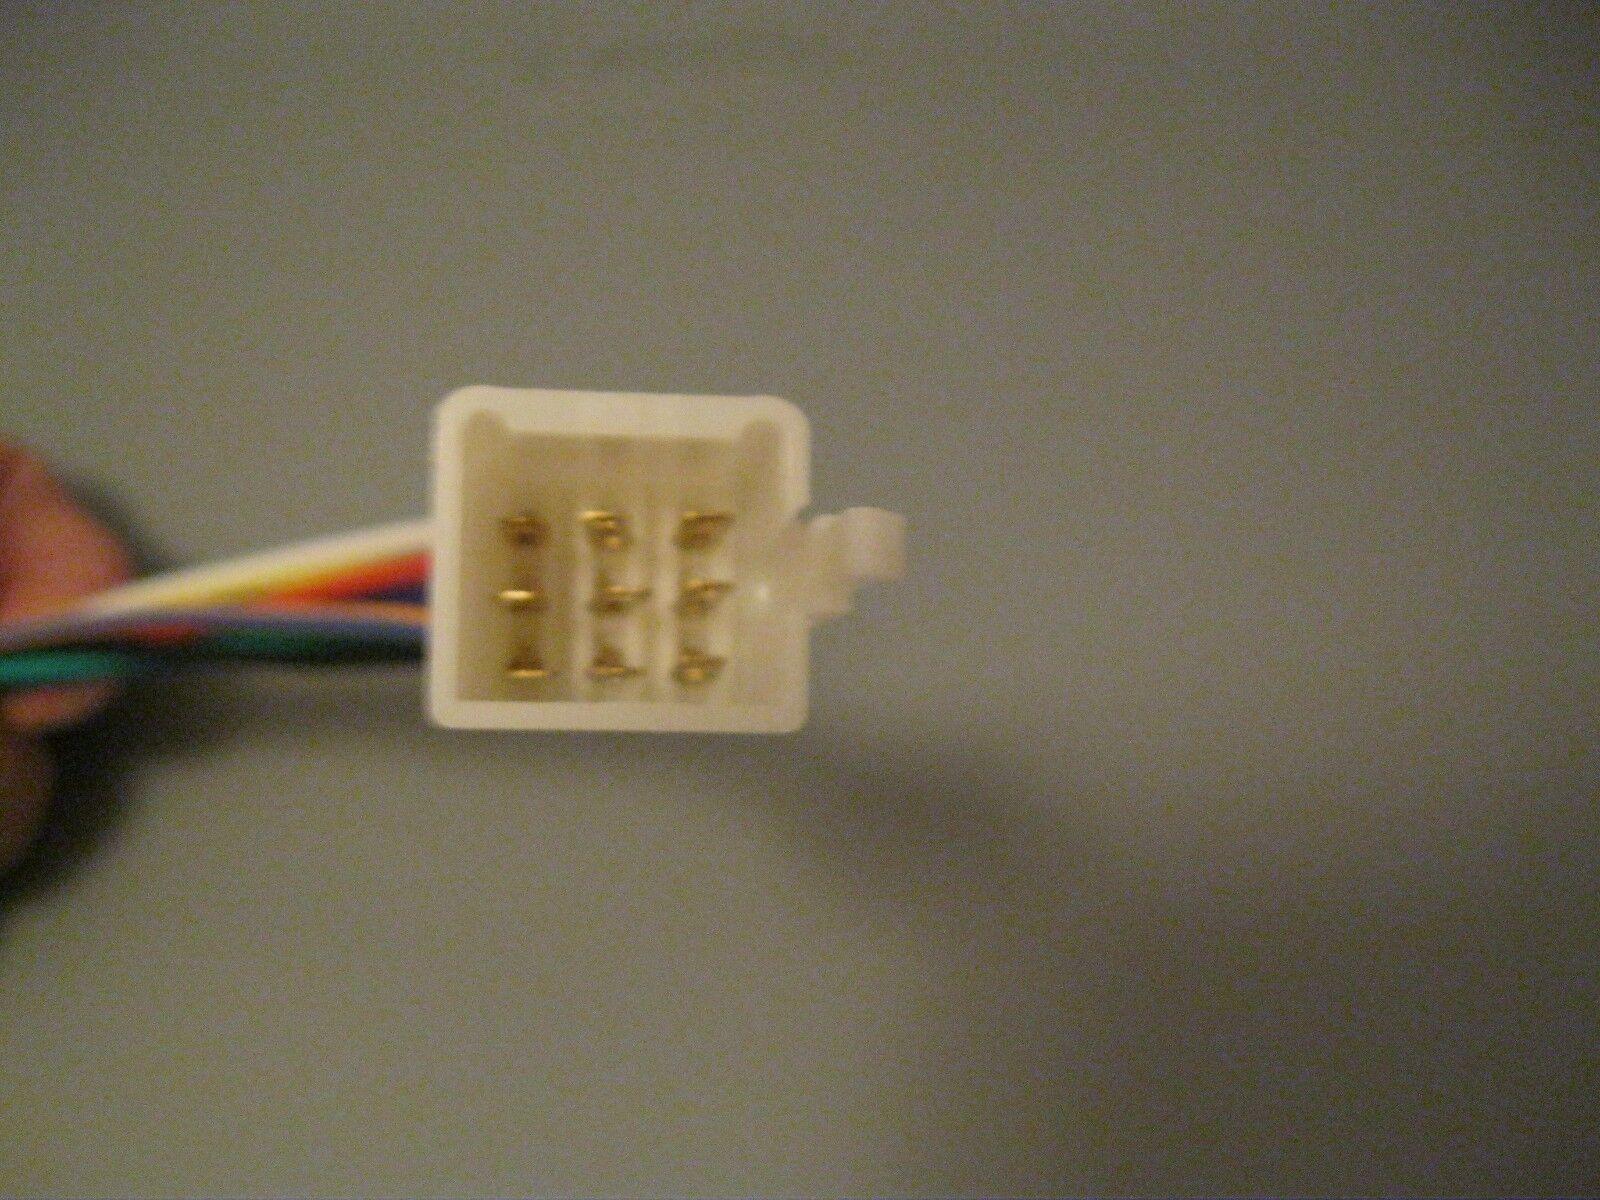 s l1600 kubota rtv 9 pin radio tractor plug female male cd player in dash kubota radio wiring harness at mr168.co